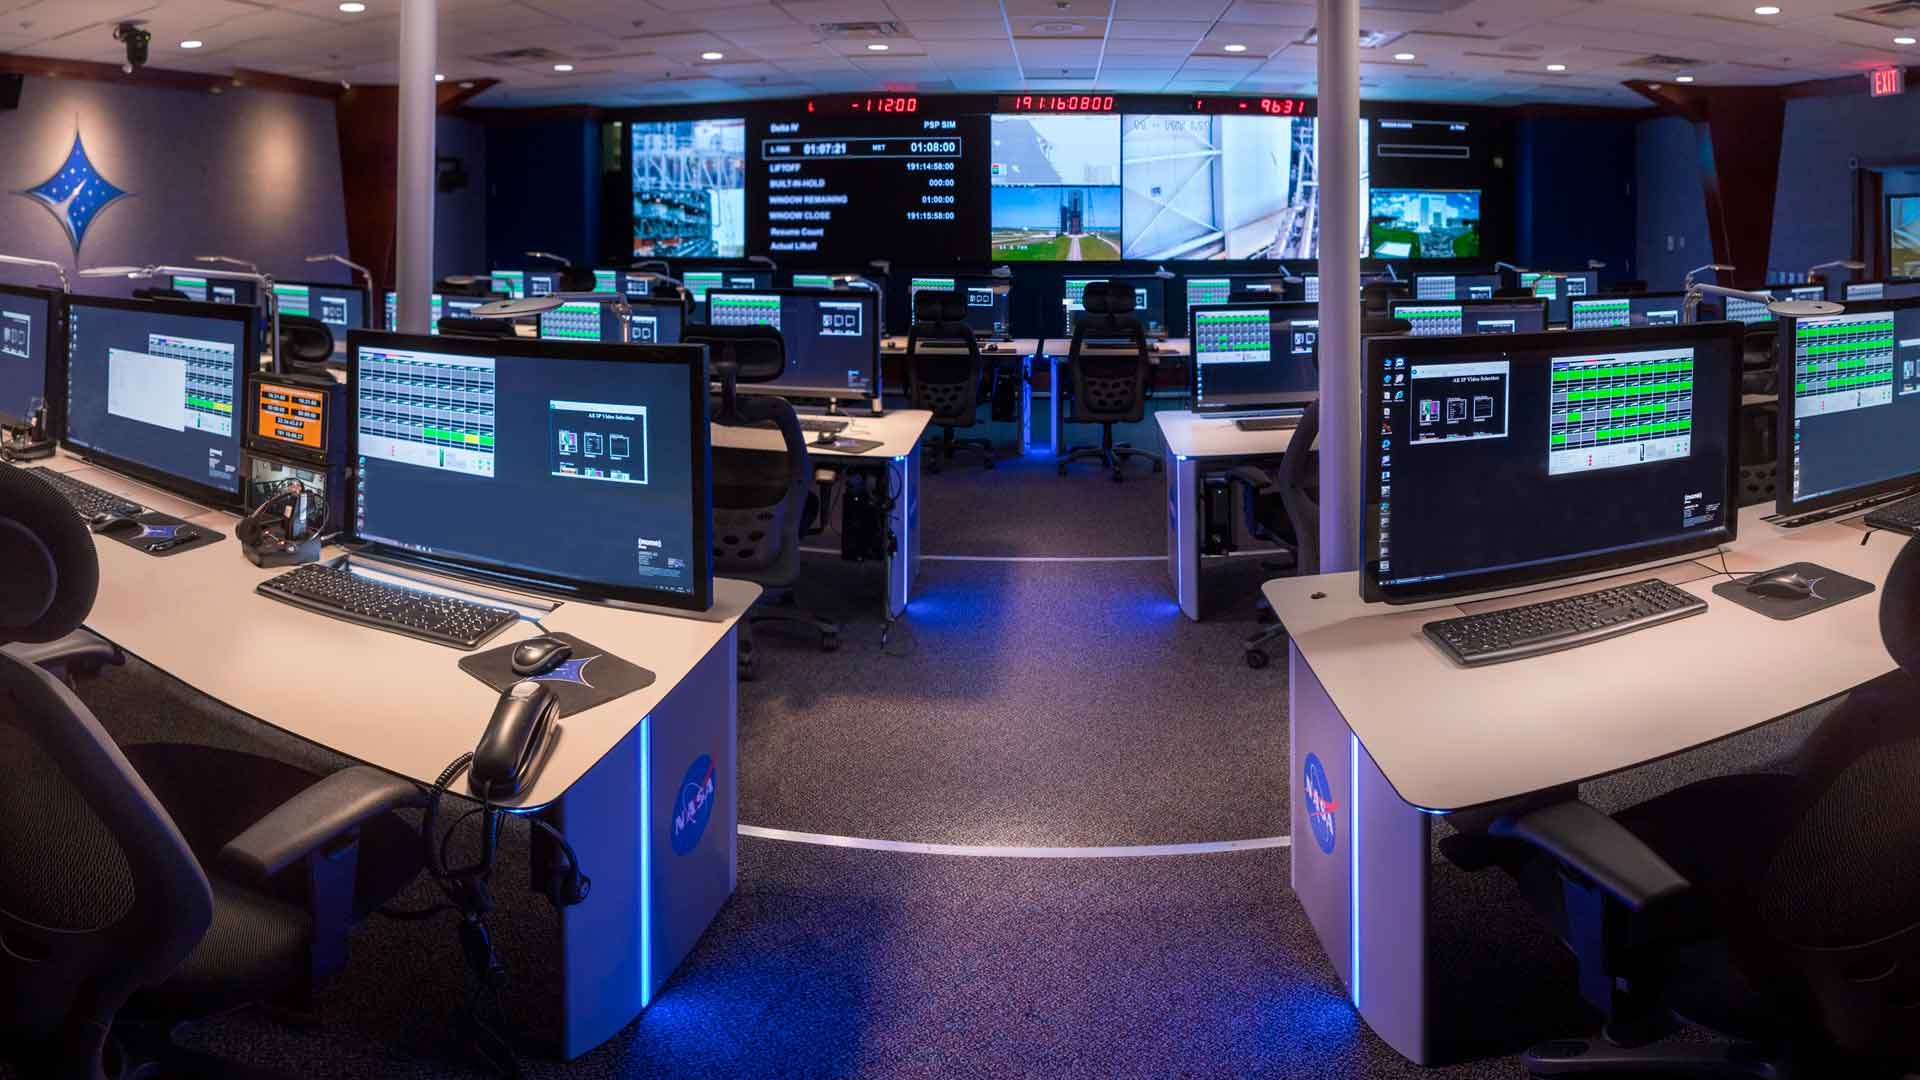 Control center - Control Rooms